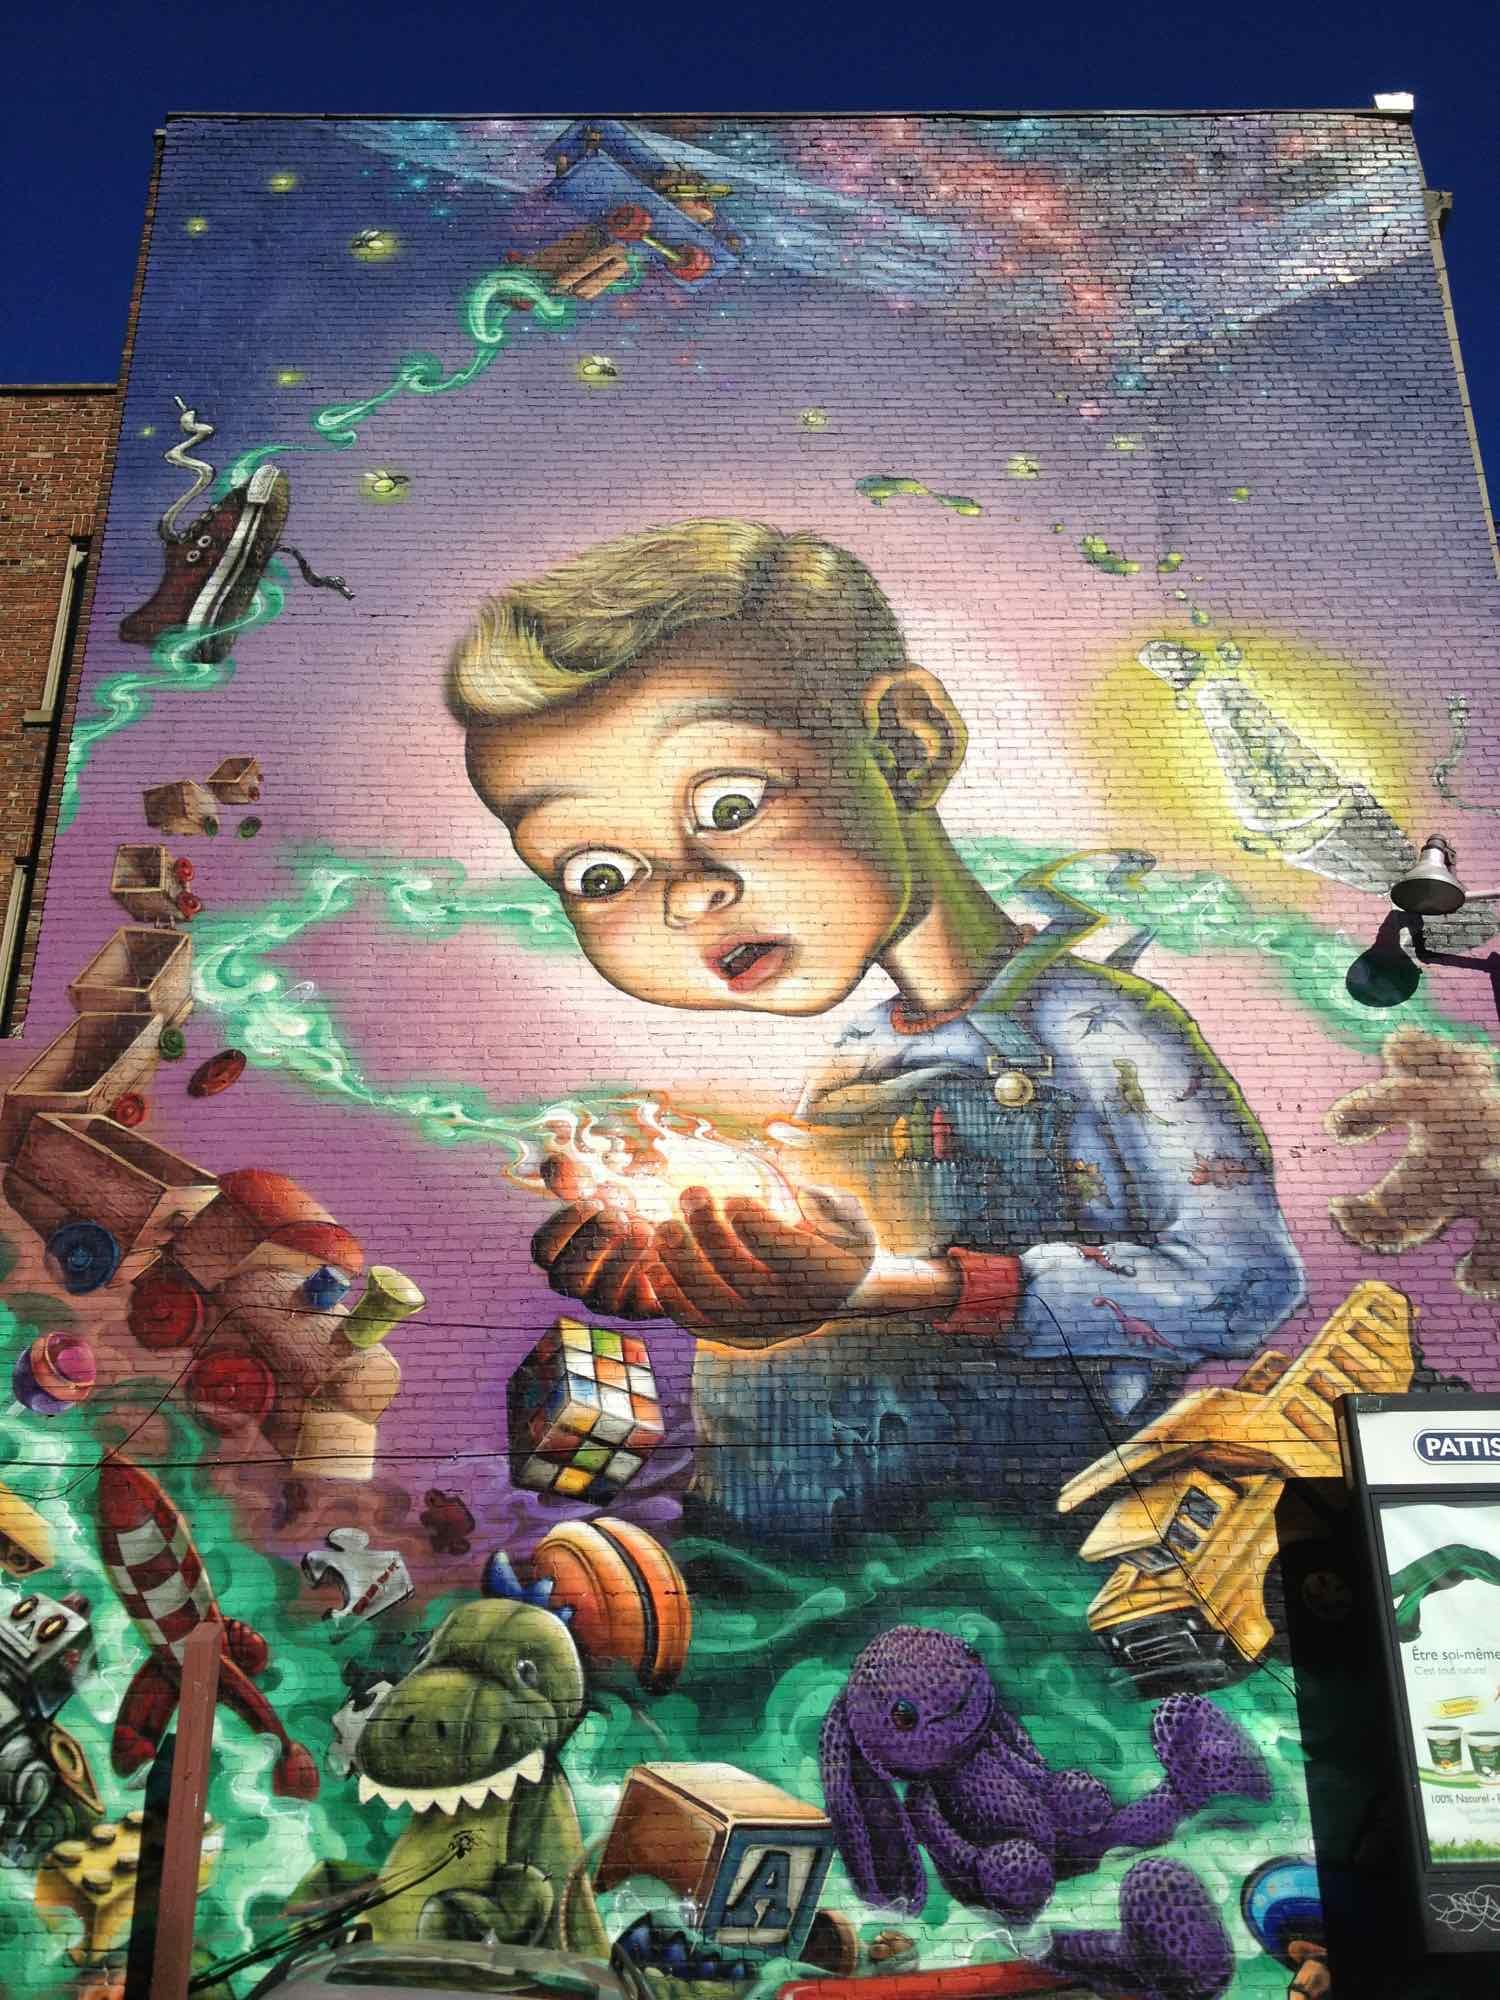 The_Walls_Of_Montreal-Ezra_Soiferman - 1 (2).jpg